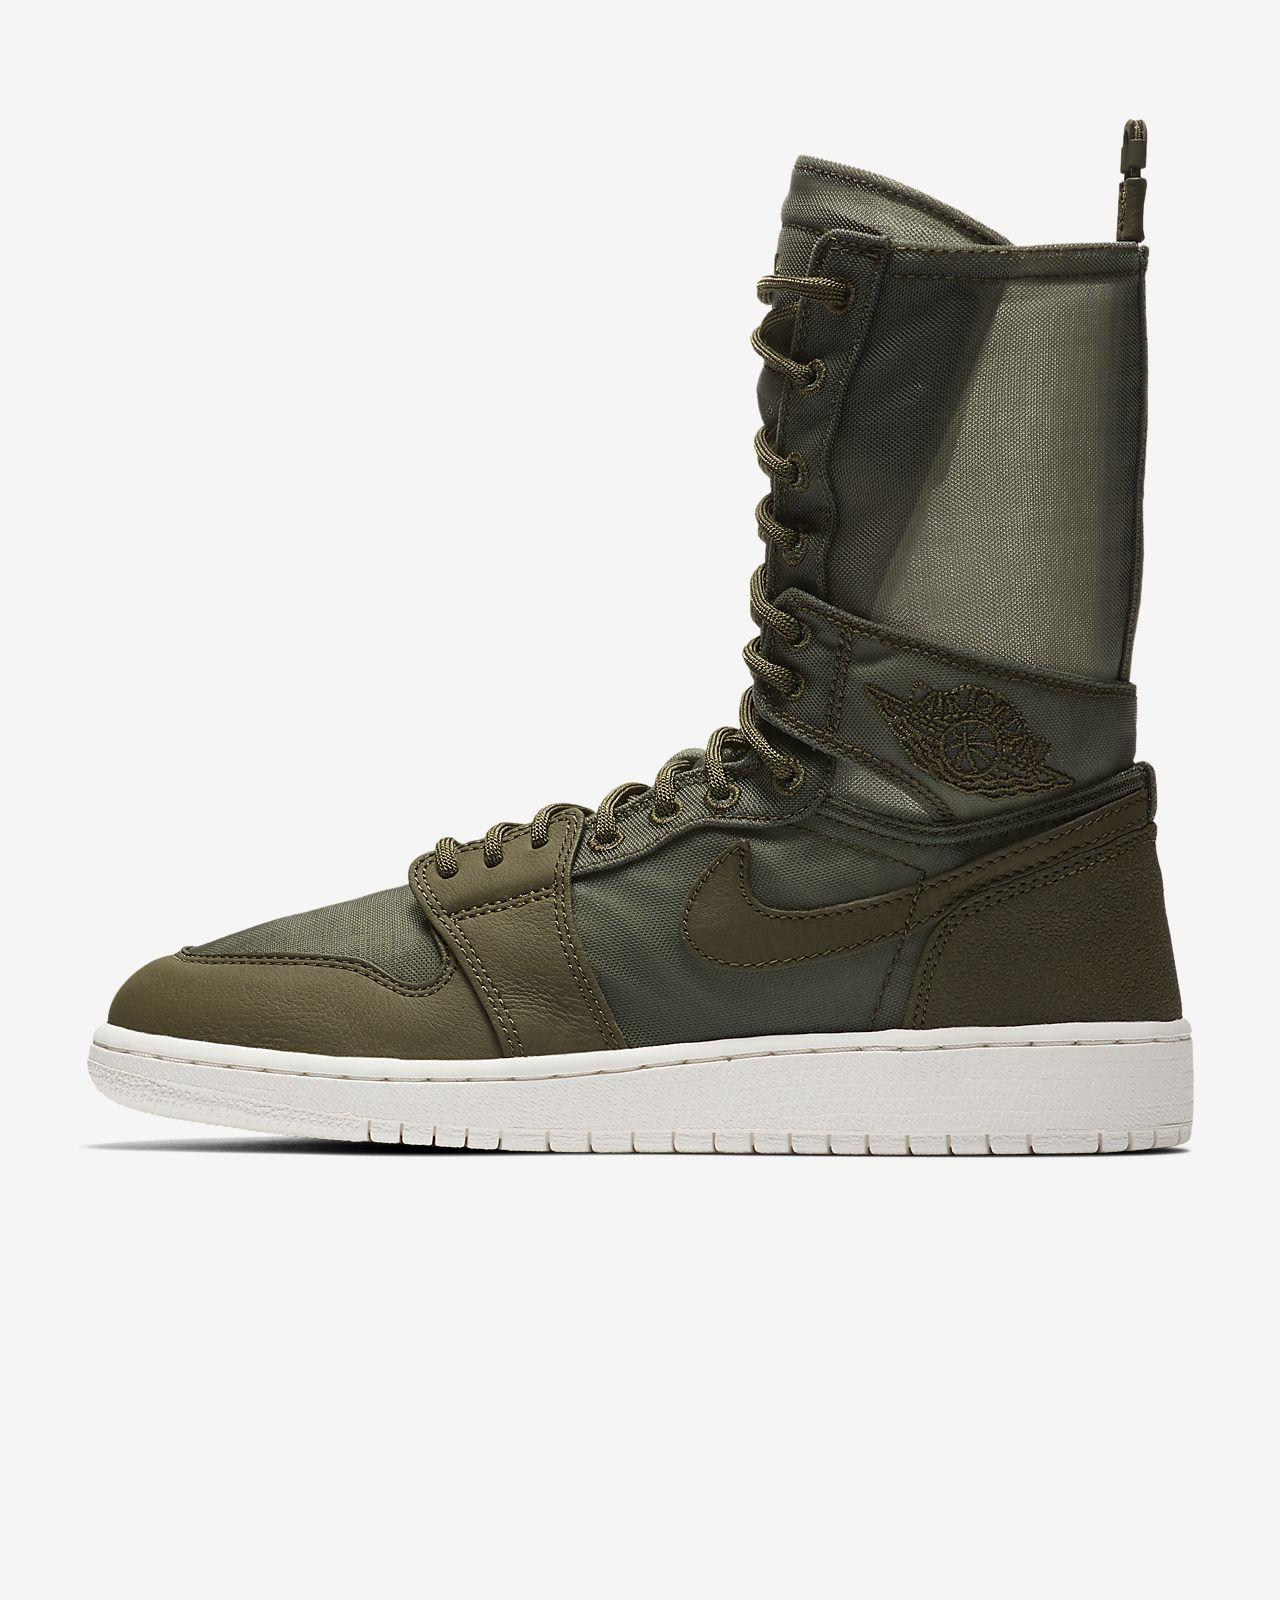 1f2a62432cf395 Calzado para mujer Air Jordan 1 Explorer XX. Nike.com MX